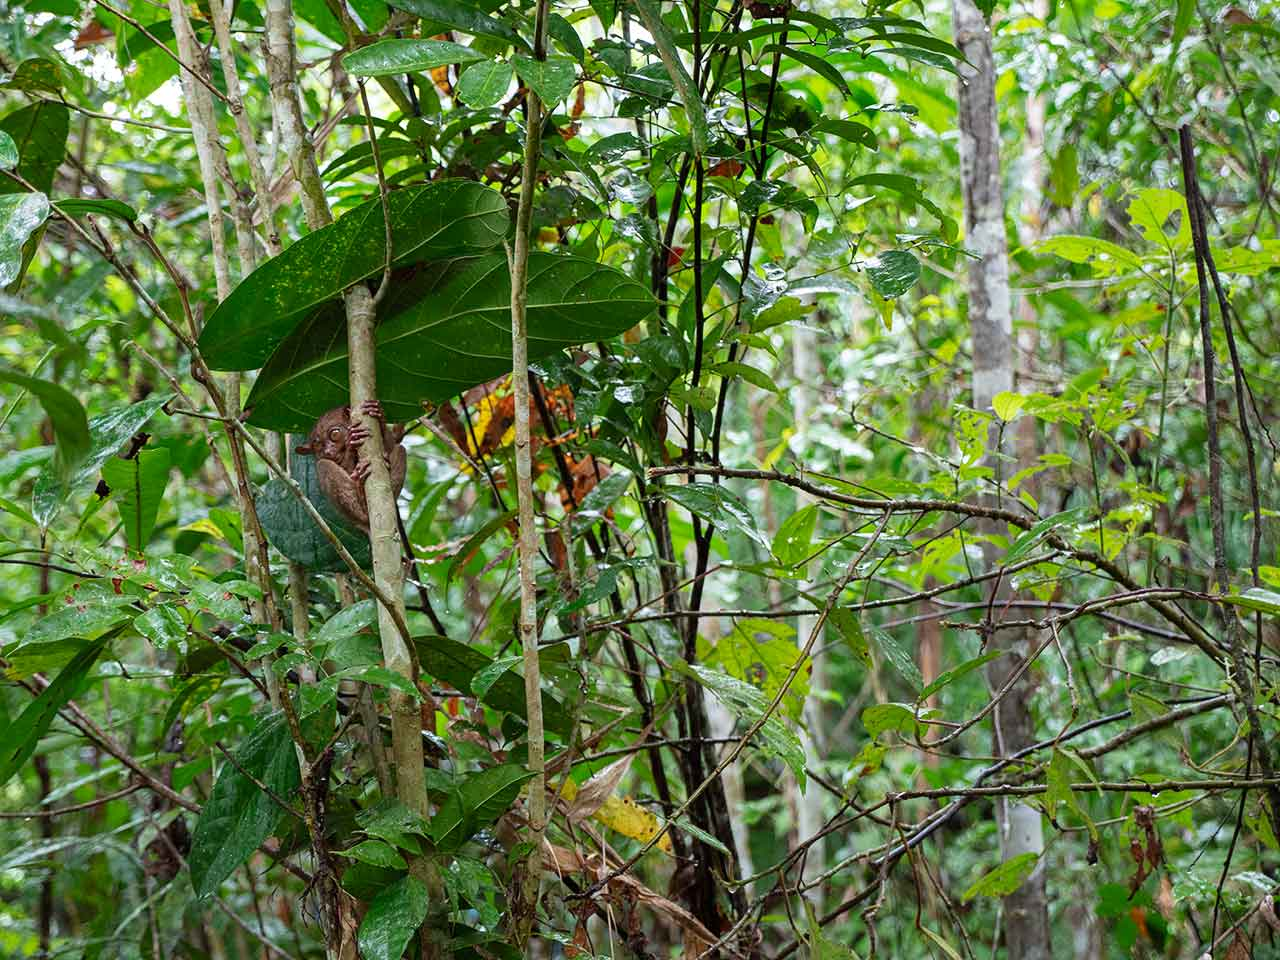 Tarsier im Baum